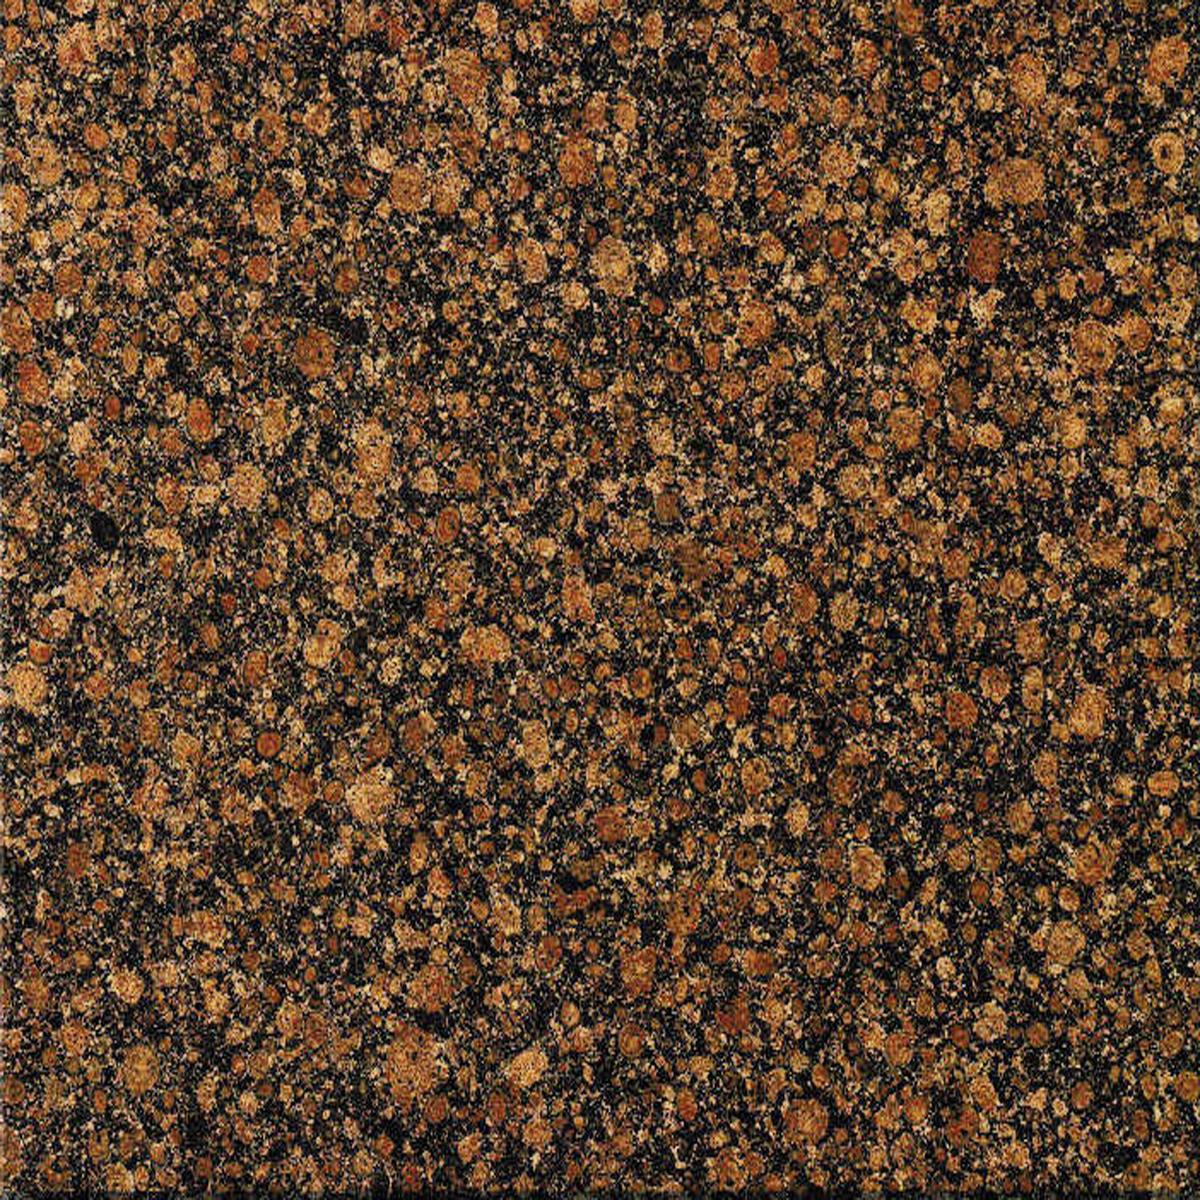 Granite Suppliers In India Best Granite Exporters In India Granite Kitchen Countertops